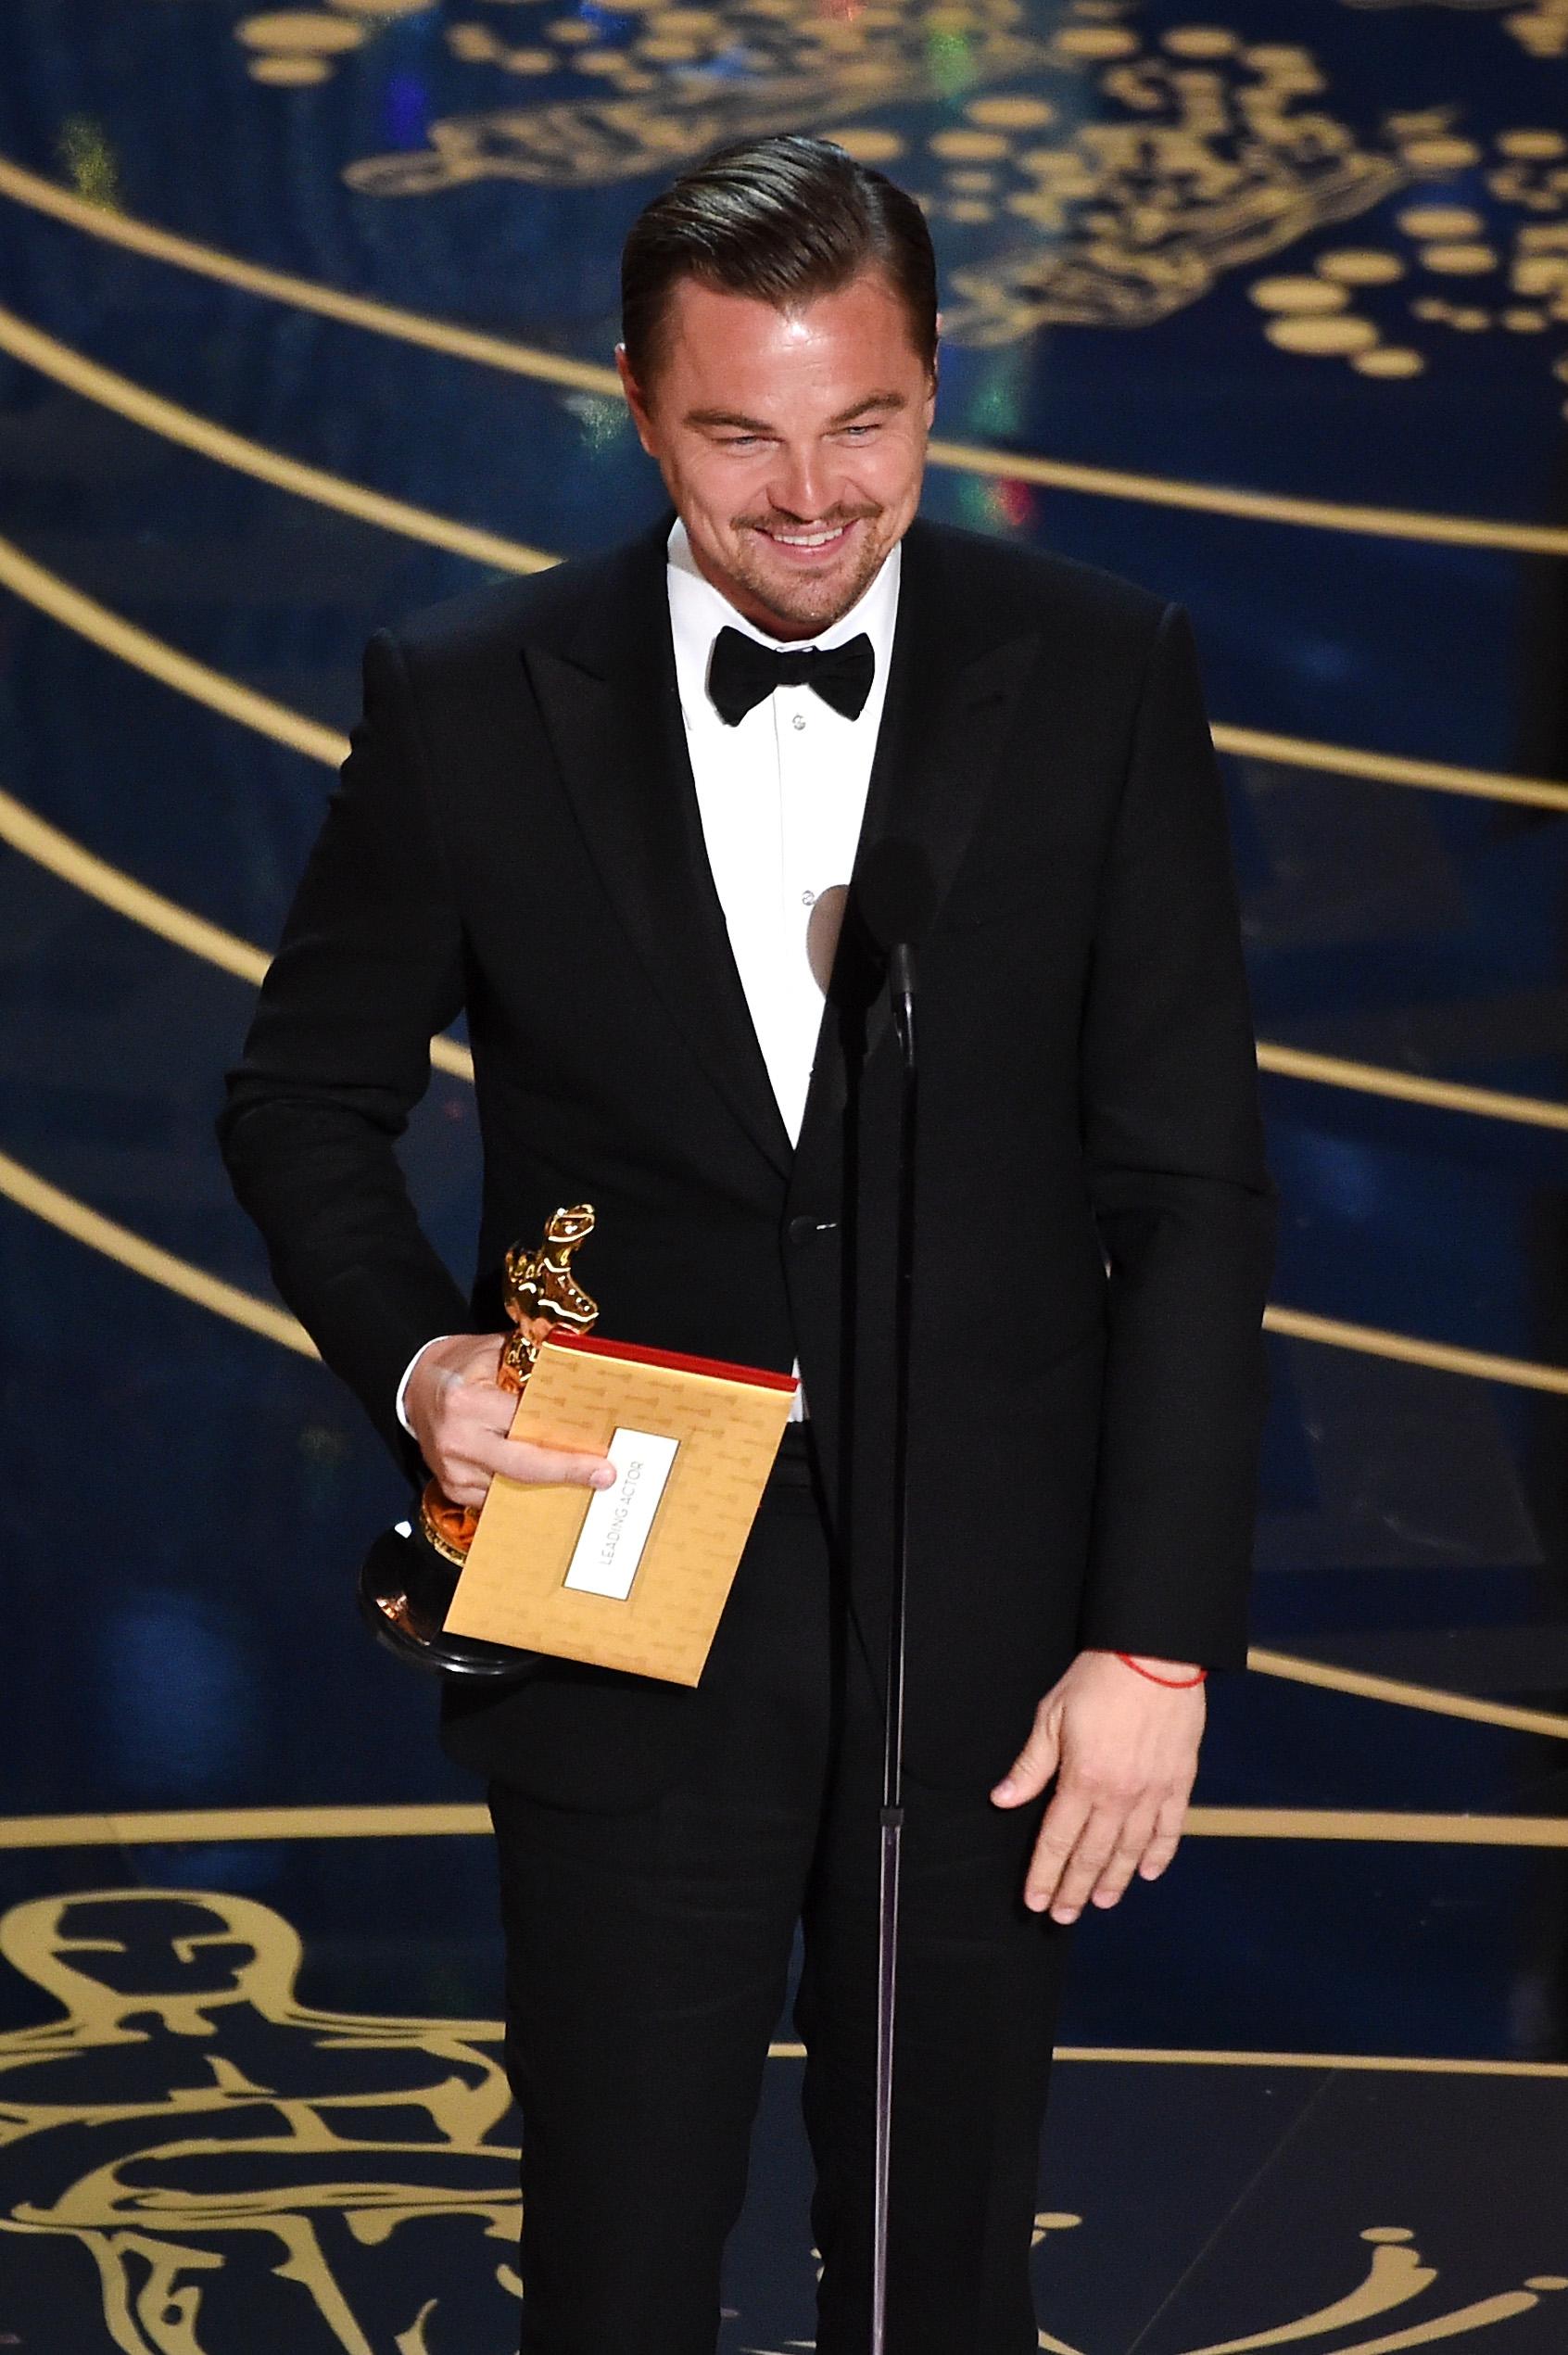 Leonardo DiCaprio is the 2016 Oscar Winner for Best Actor - Oscars